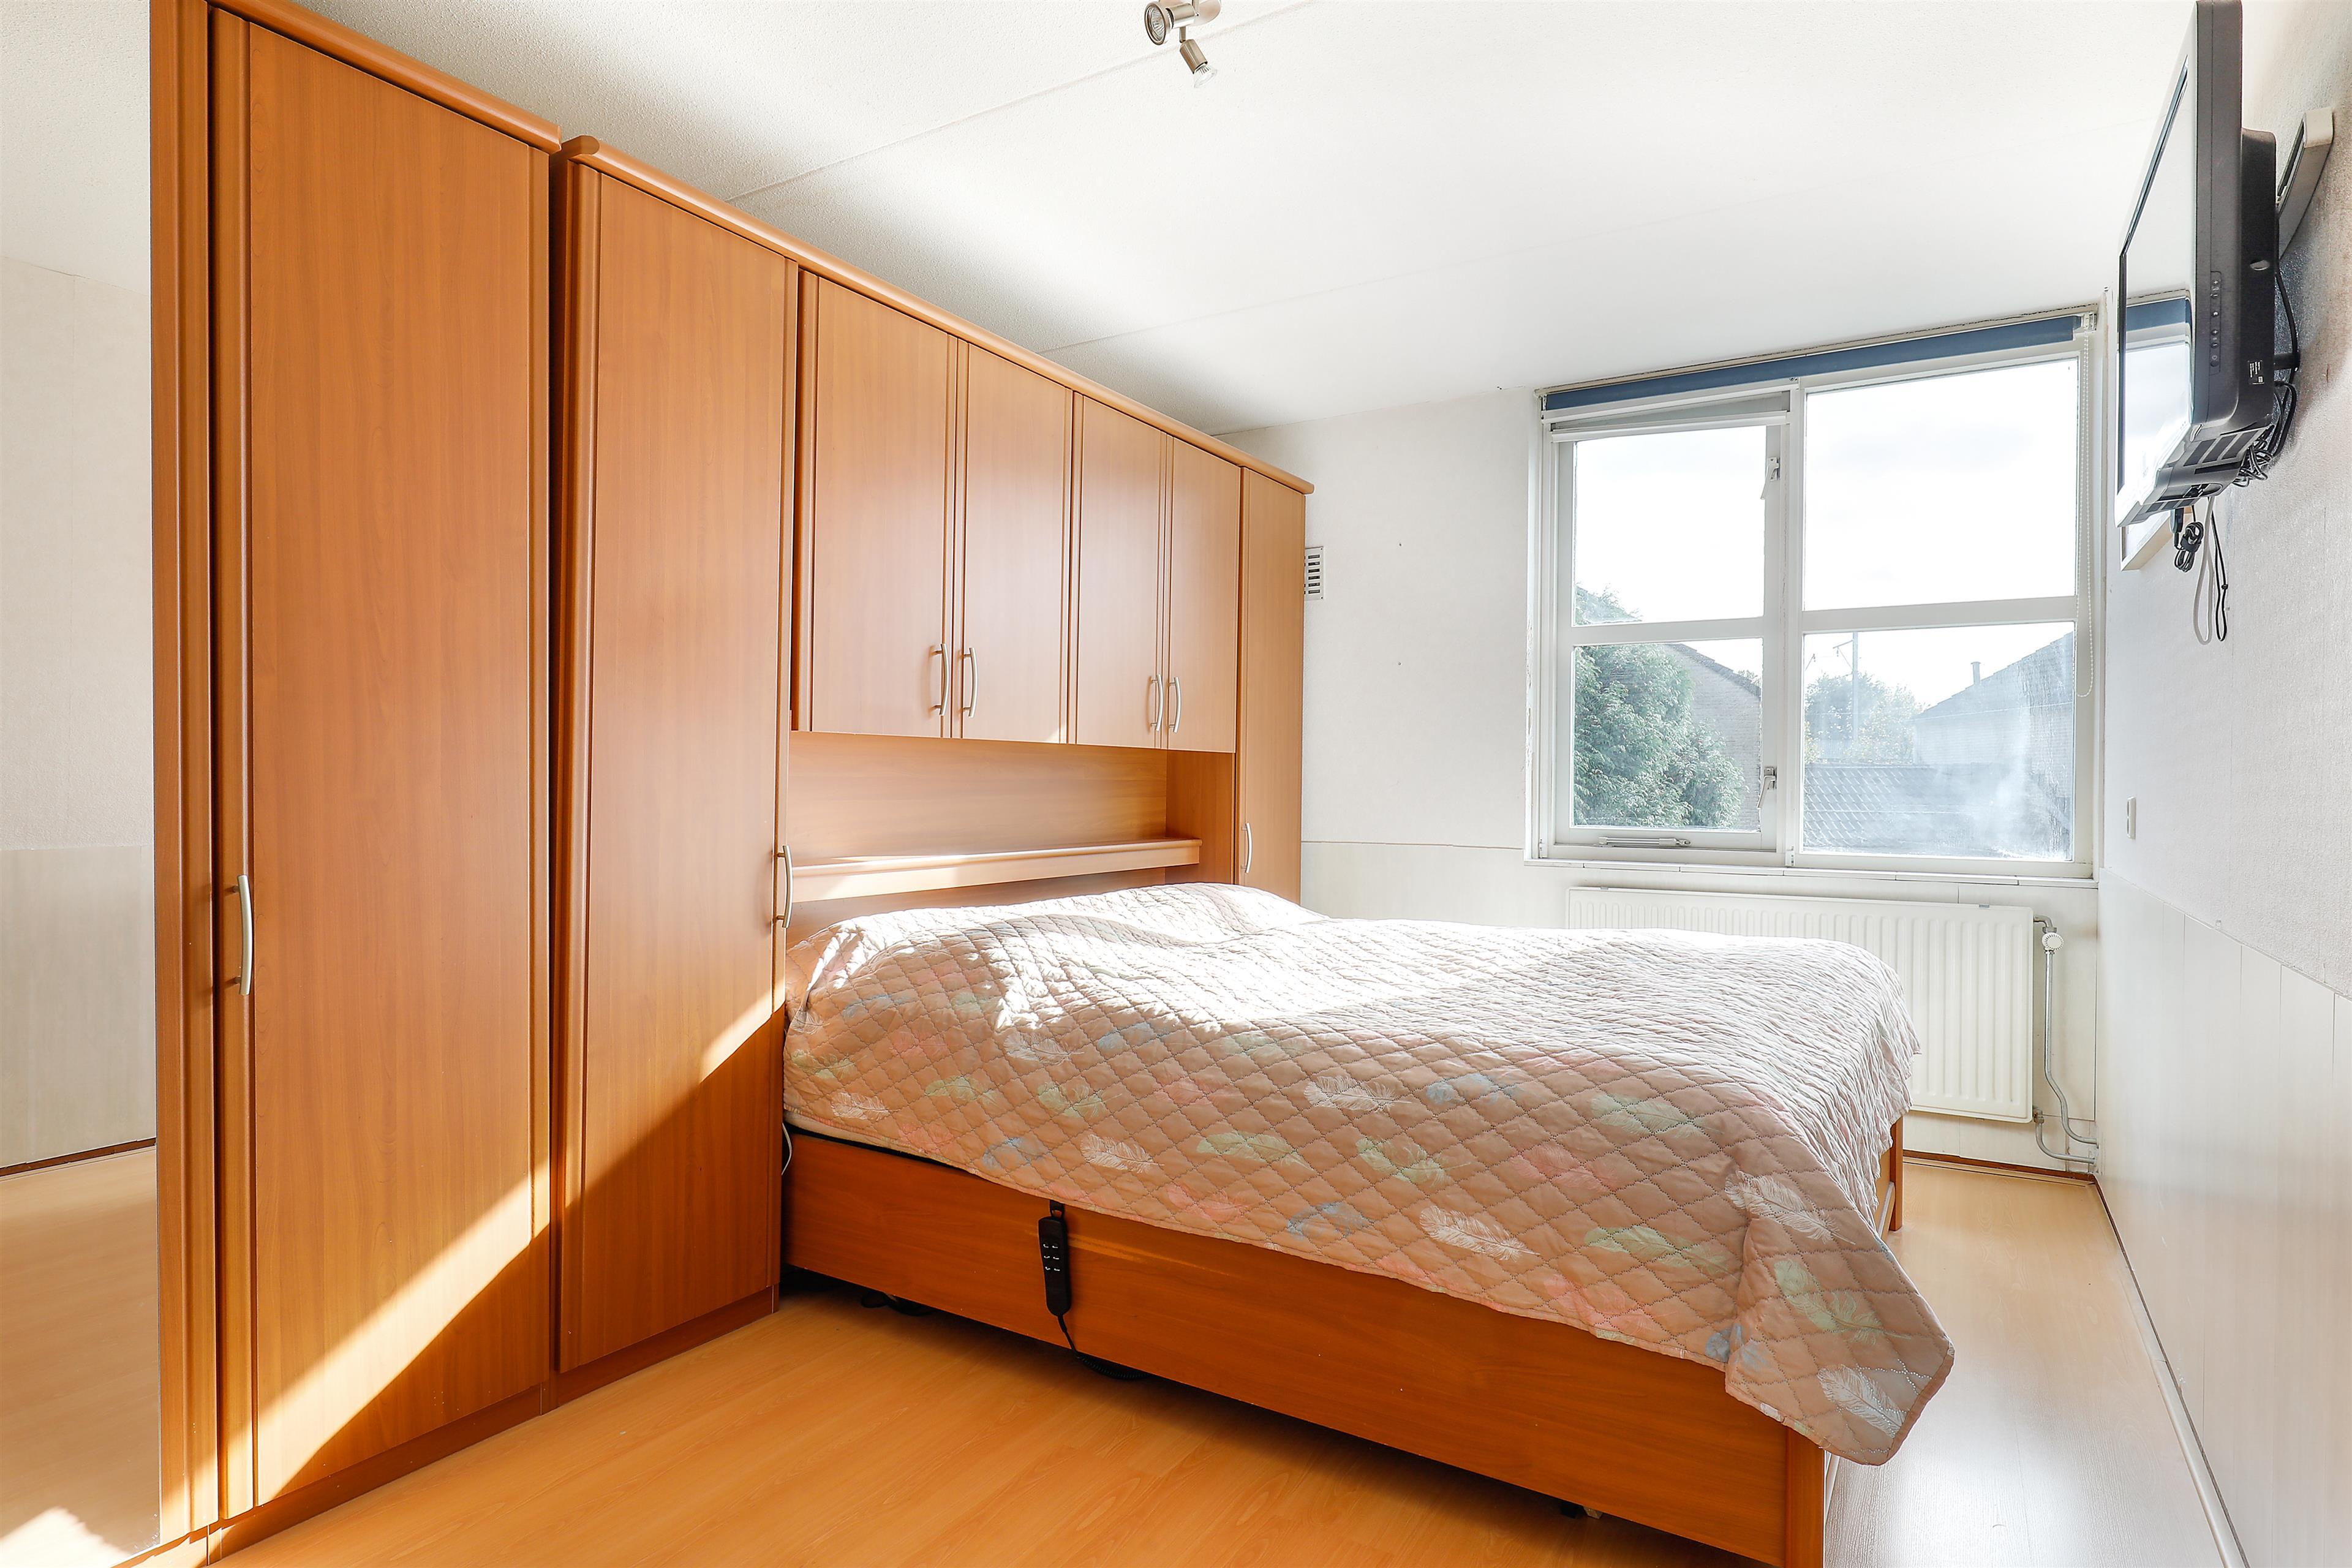 Zonwering Slaapkamer 51 : Te koop: middachtenlaan 51 almere hoekstra en van eck